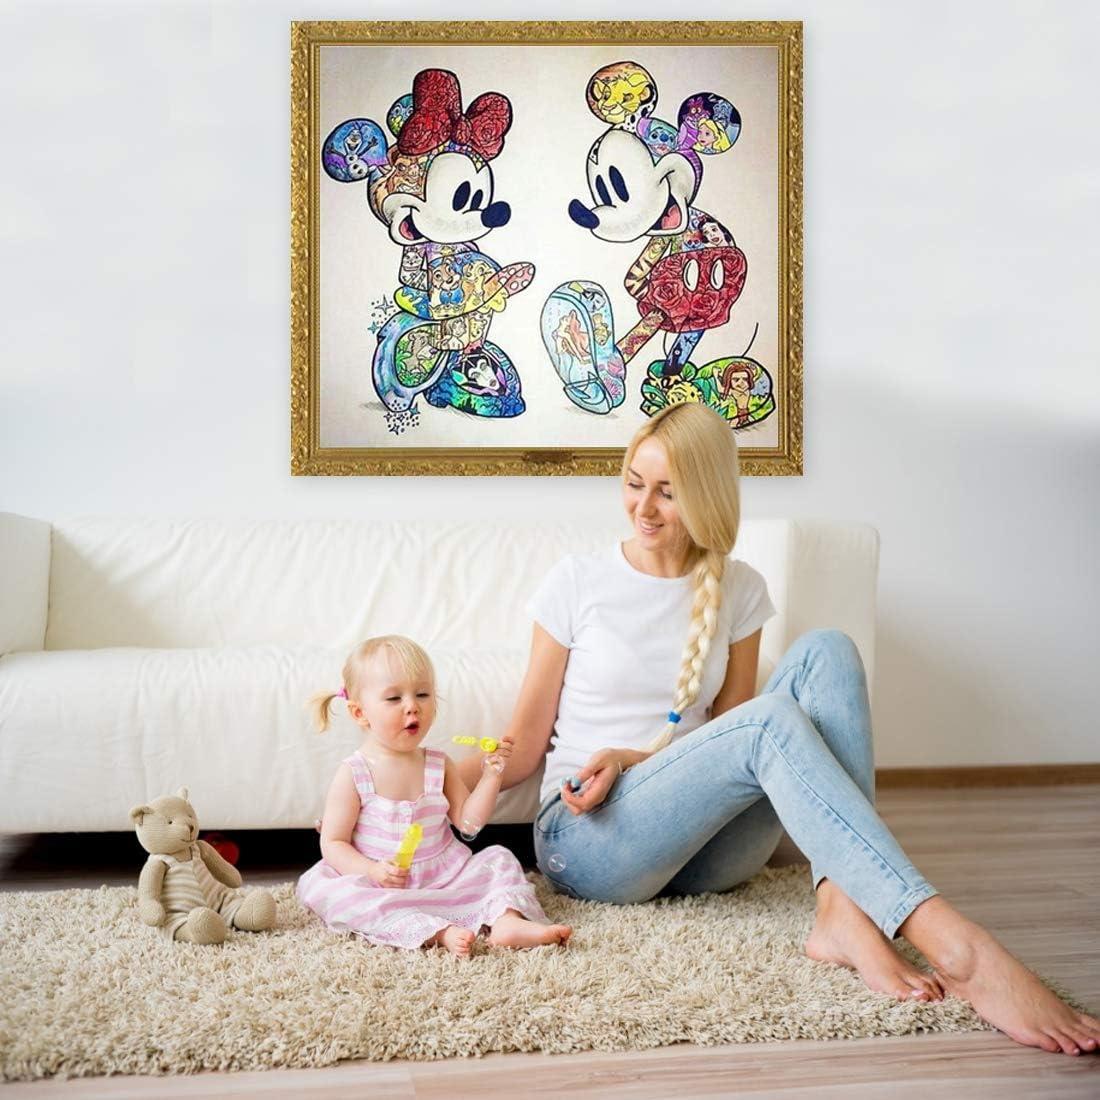 Tomicy Kit per Diamond Painting 5D Resina Artist Diamond Painting Kit Completo Pittura Diamante per Numeri Mickey Mouse Bricolage Diamond Painting per Adulti Bambini